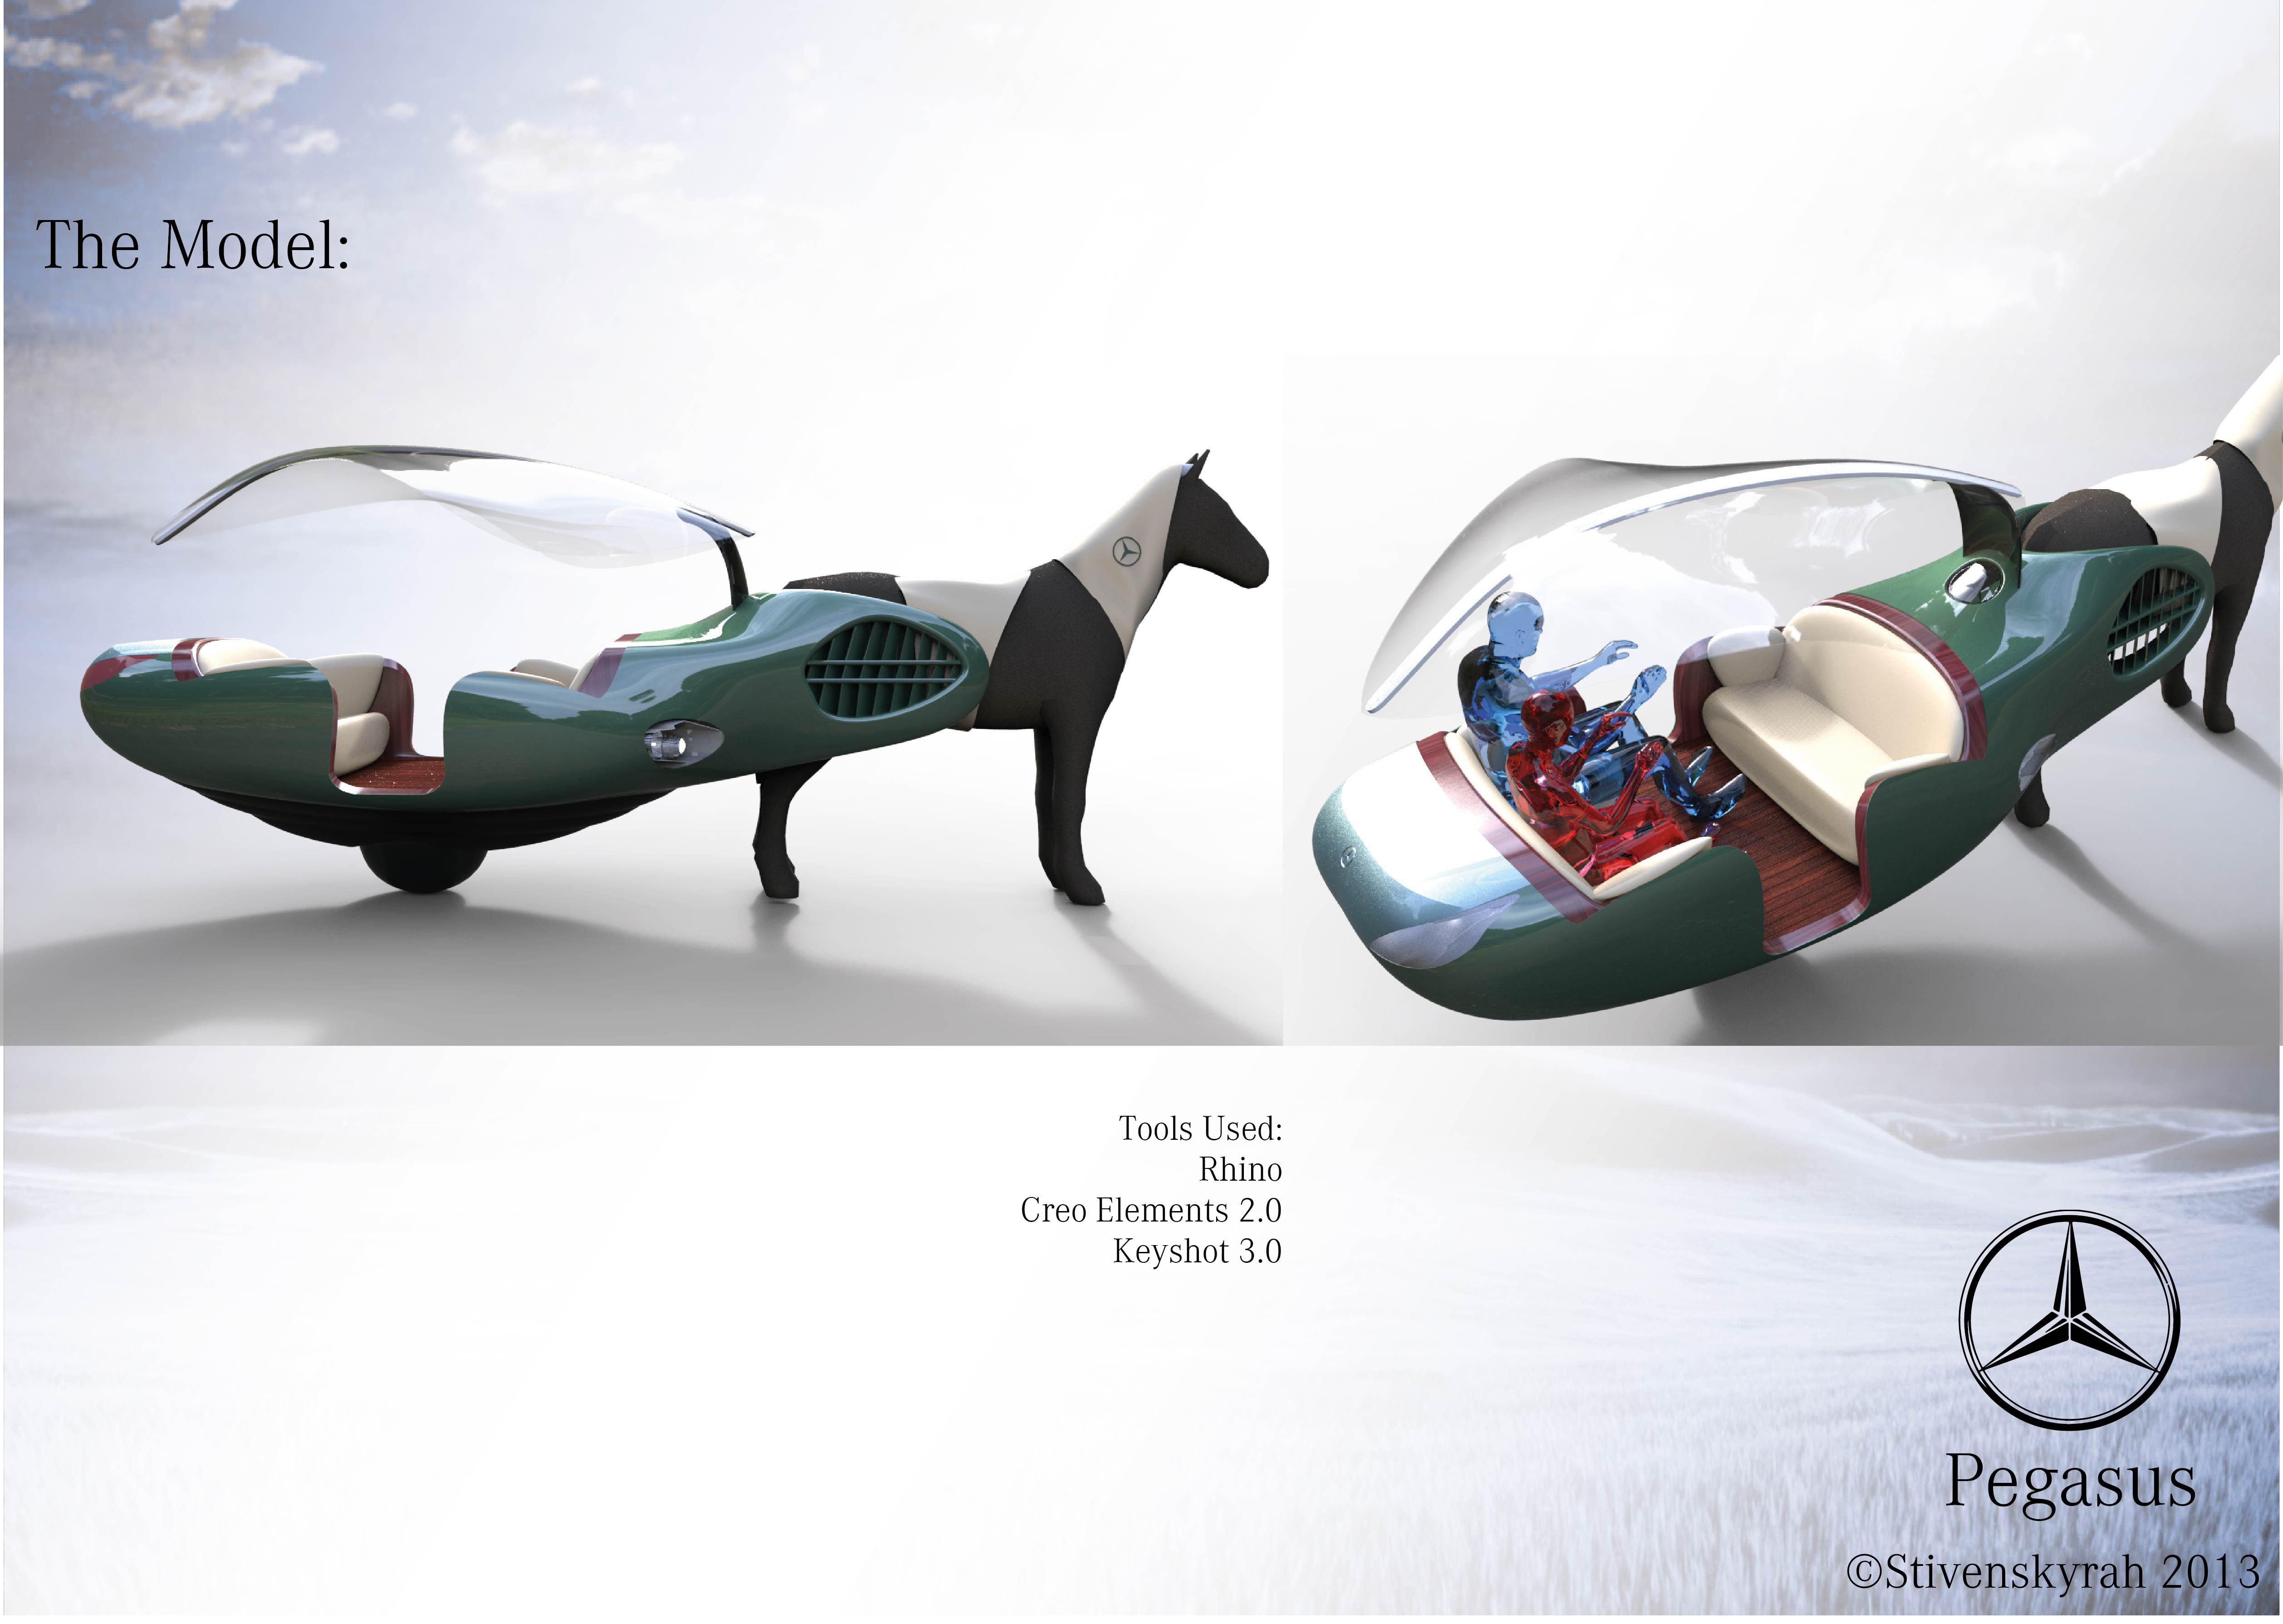 08-render-pegasus-stivenskyrah-designwithlove